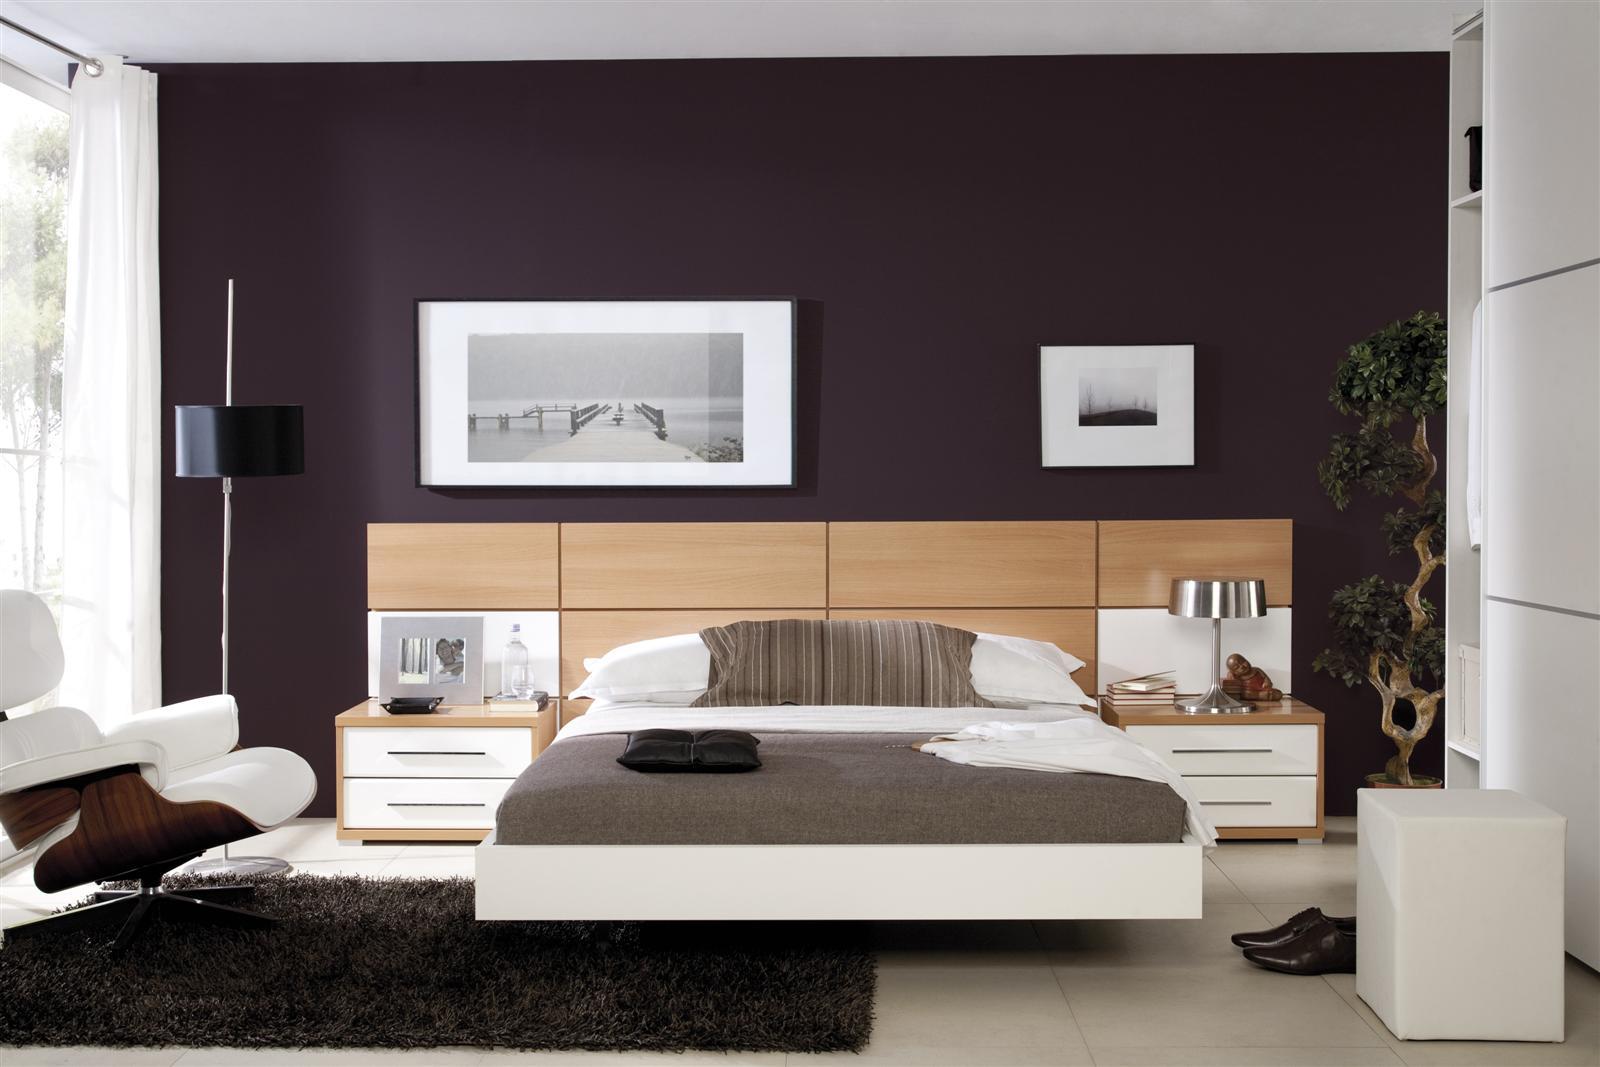 Dormitorio matrimonio moderno merino zaidin for Dormitorio matrimonio joven